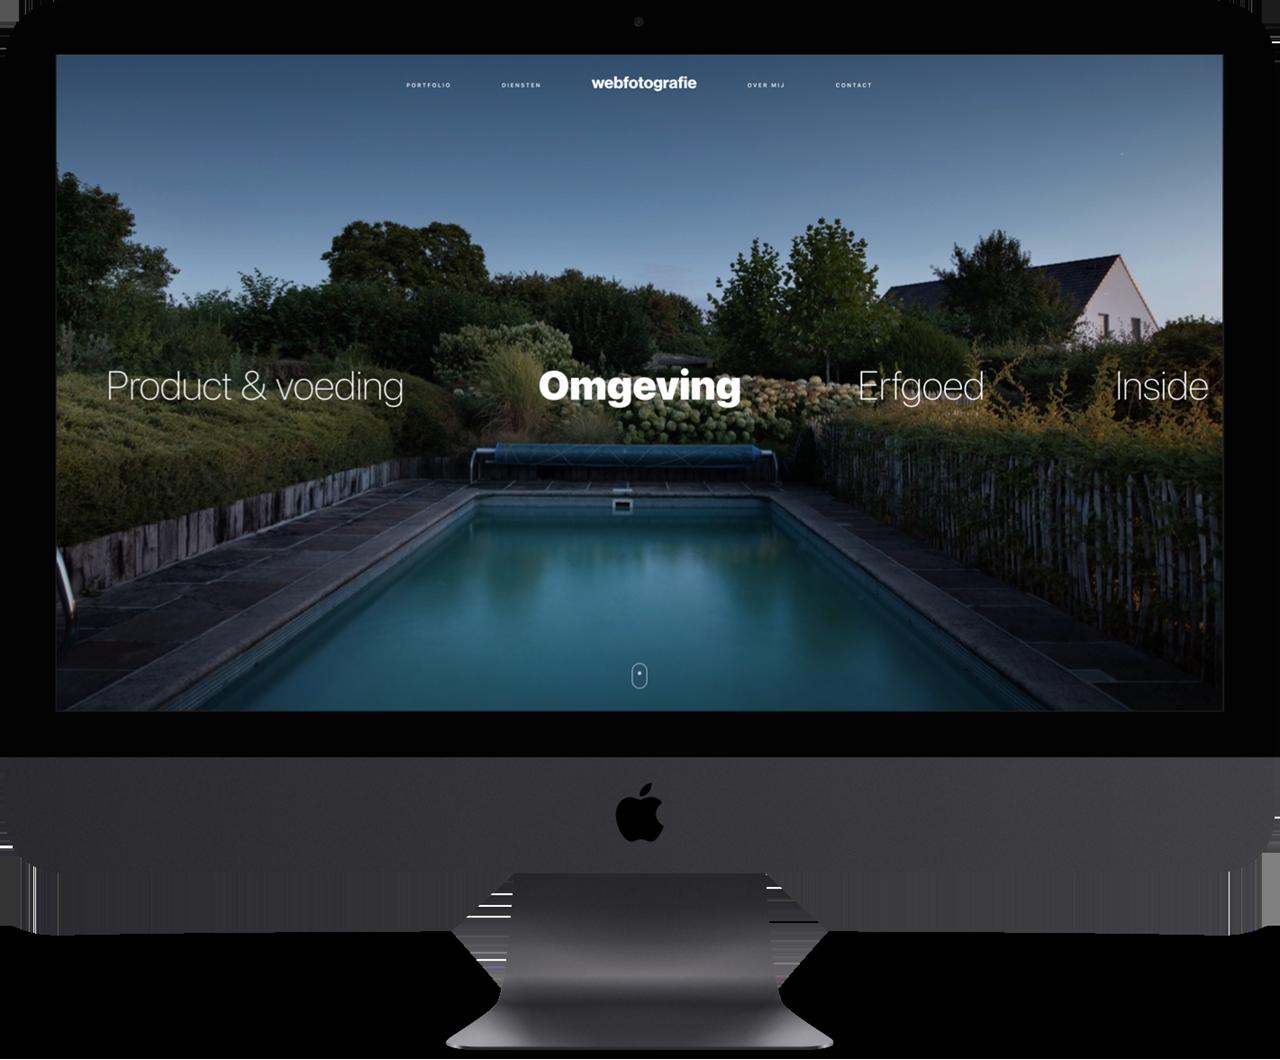 Webfotografie - iMac